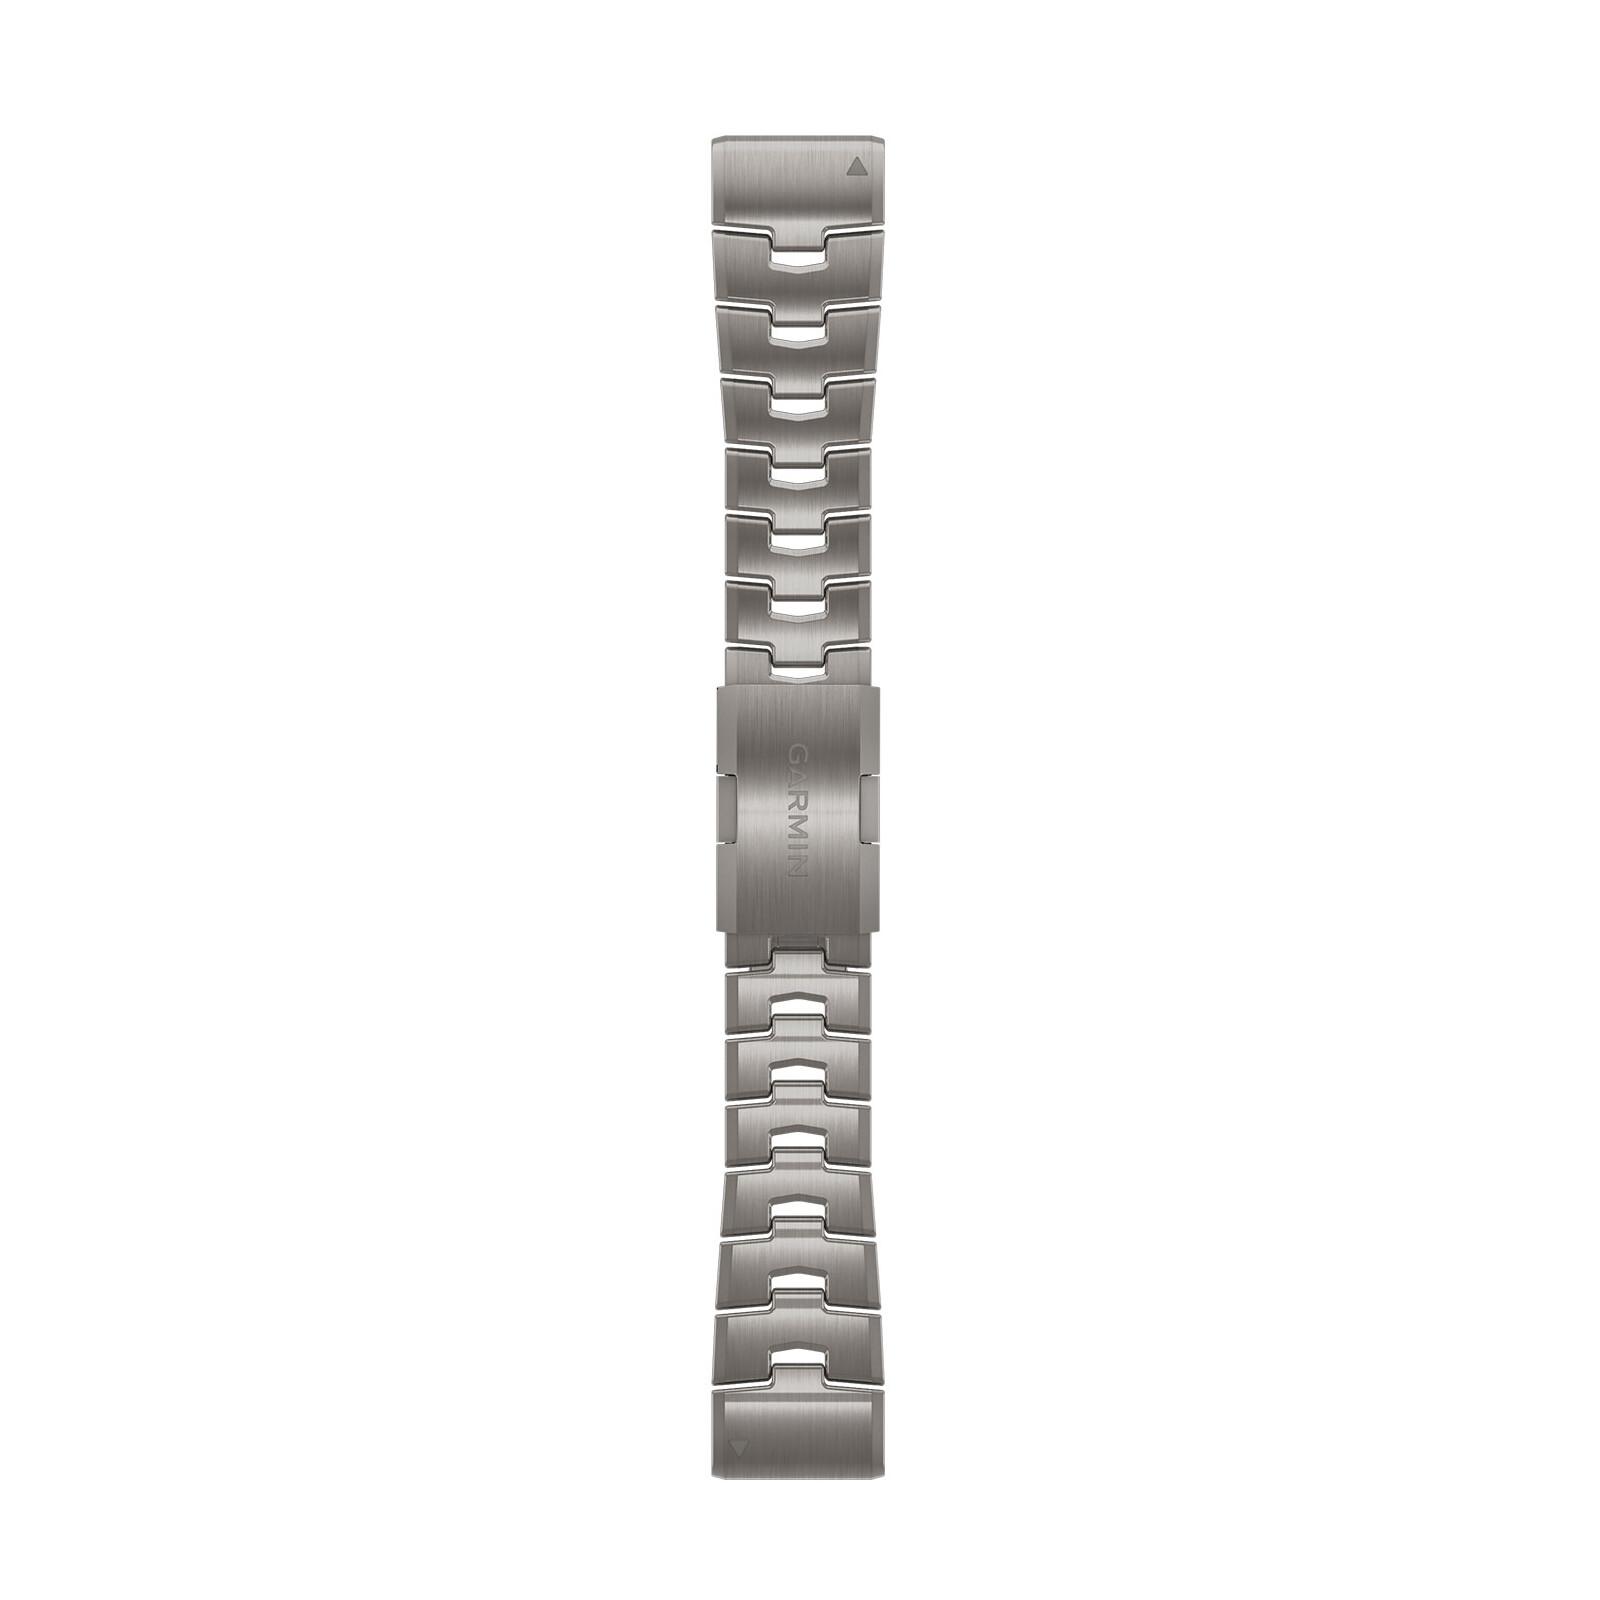 Garmin QuickFit 26 Band Titan Silber